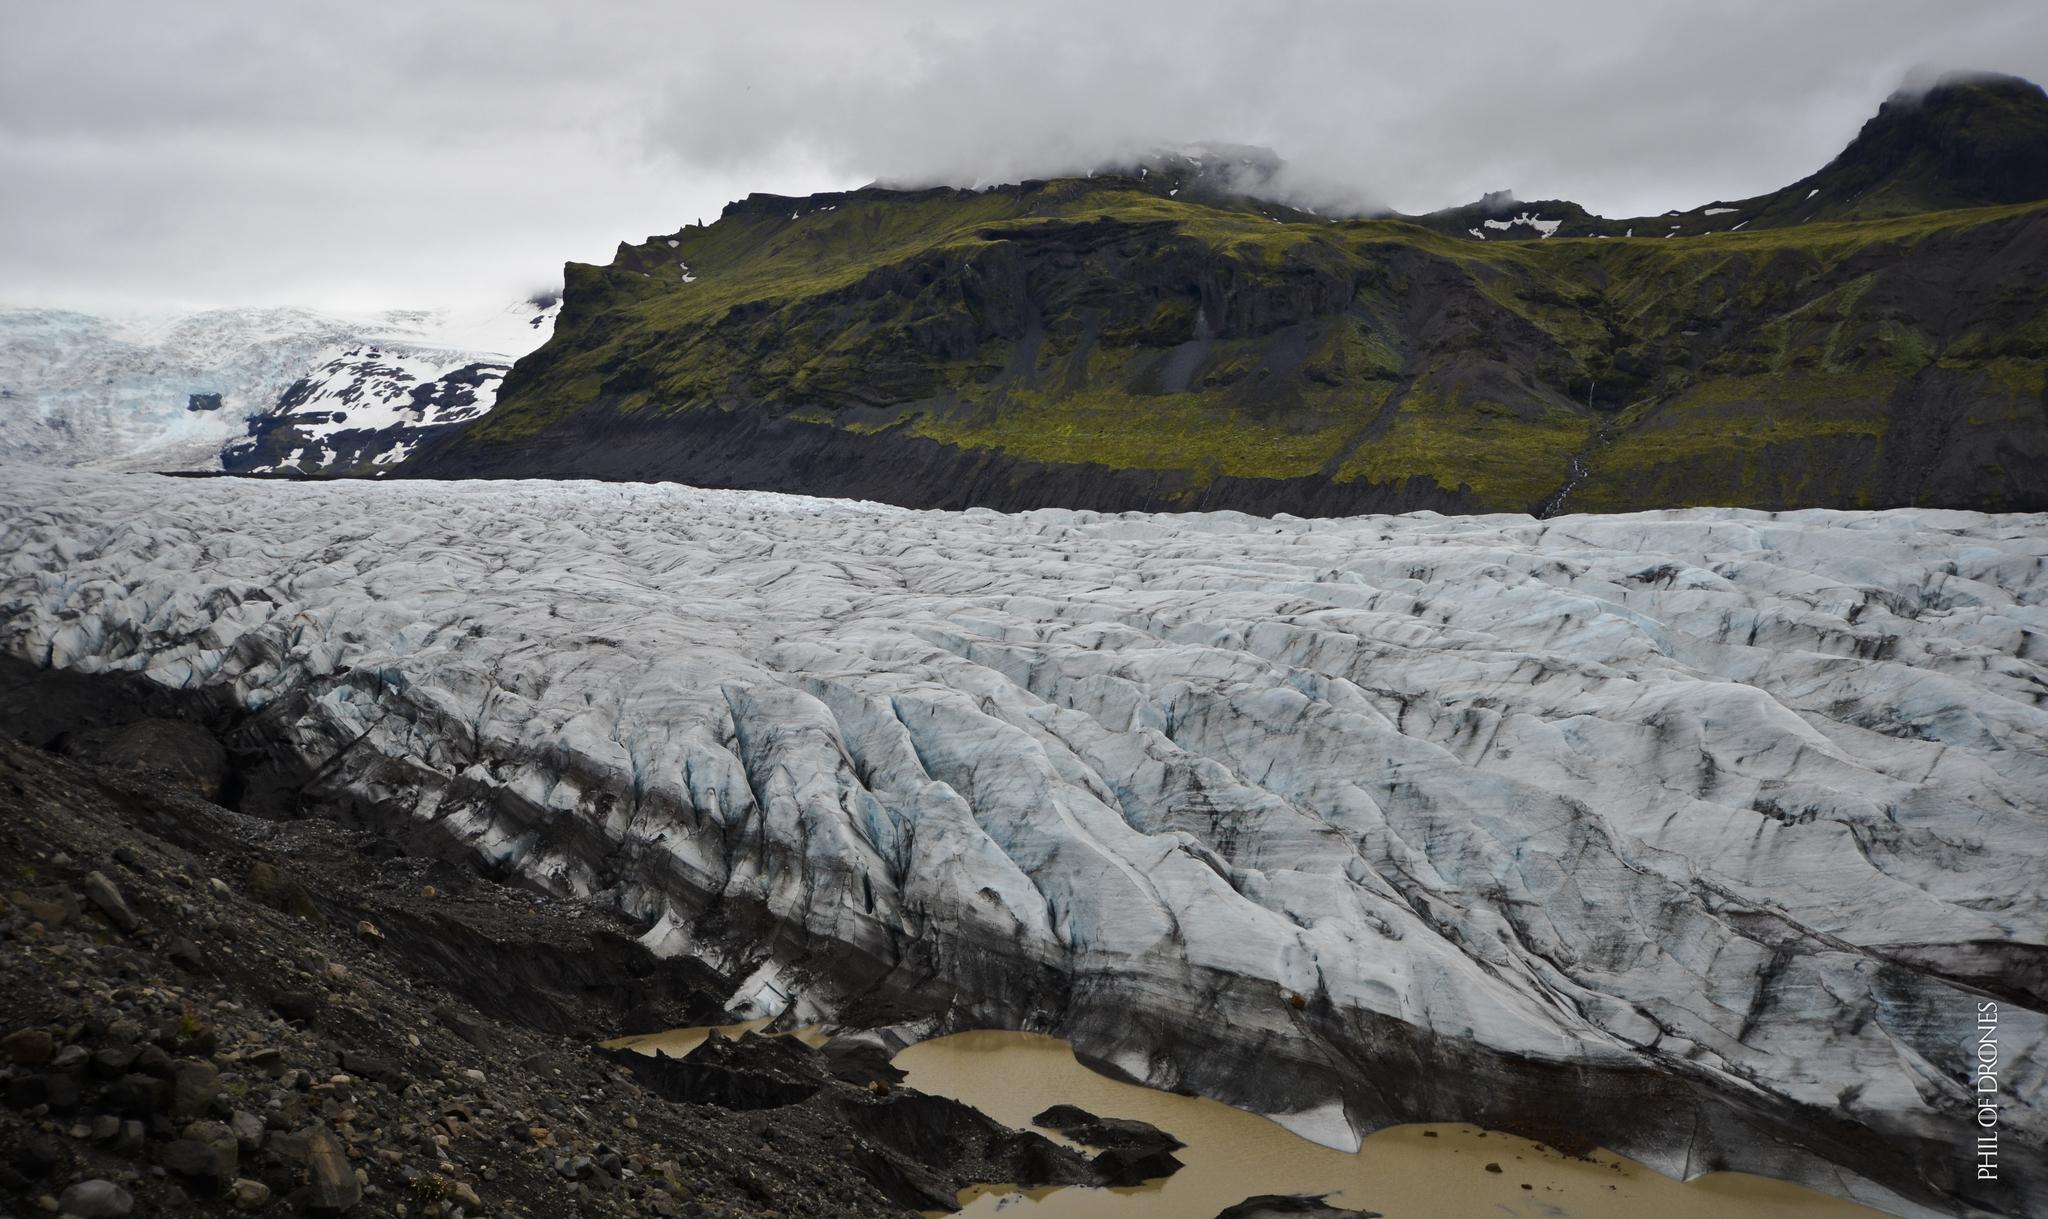 Islande 2013-4-PhM.jpg